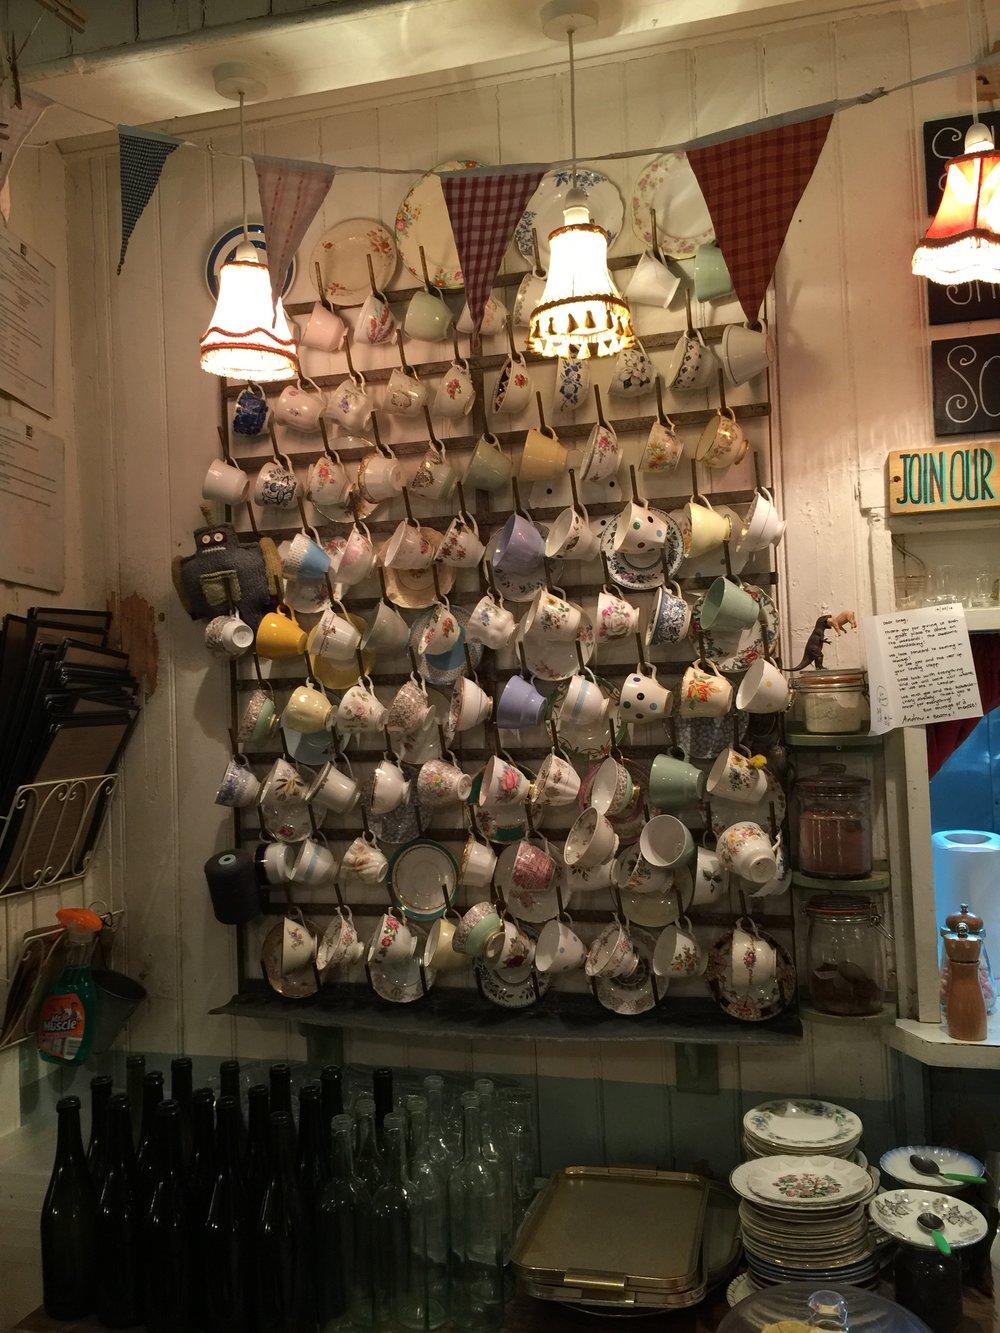 The Haberdashery vintage teacups